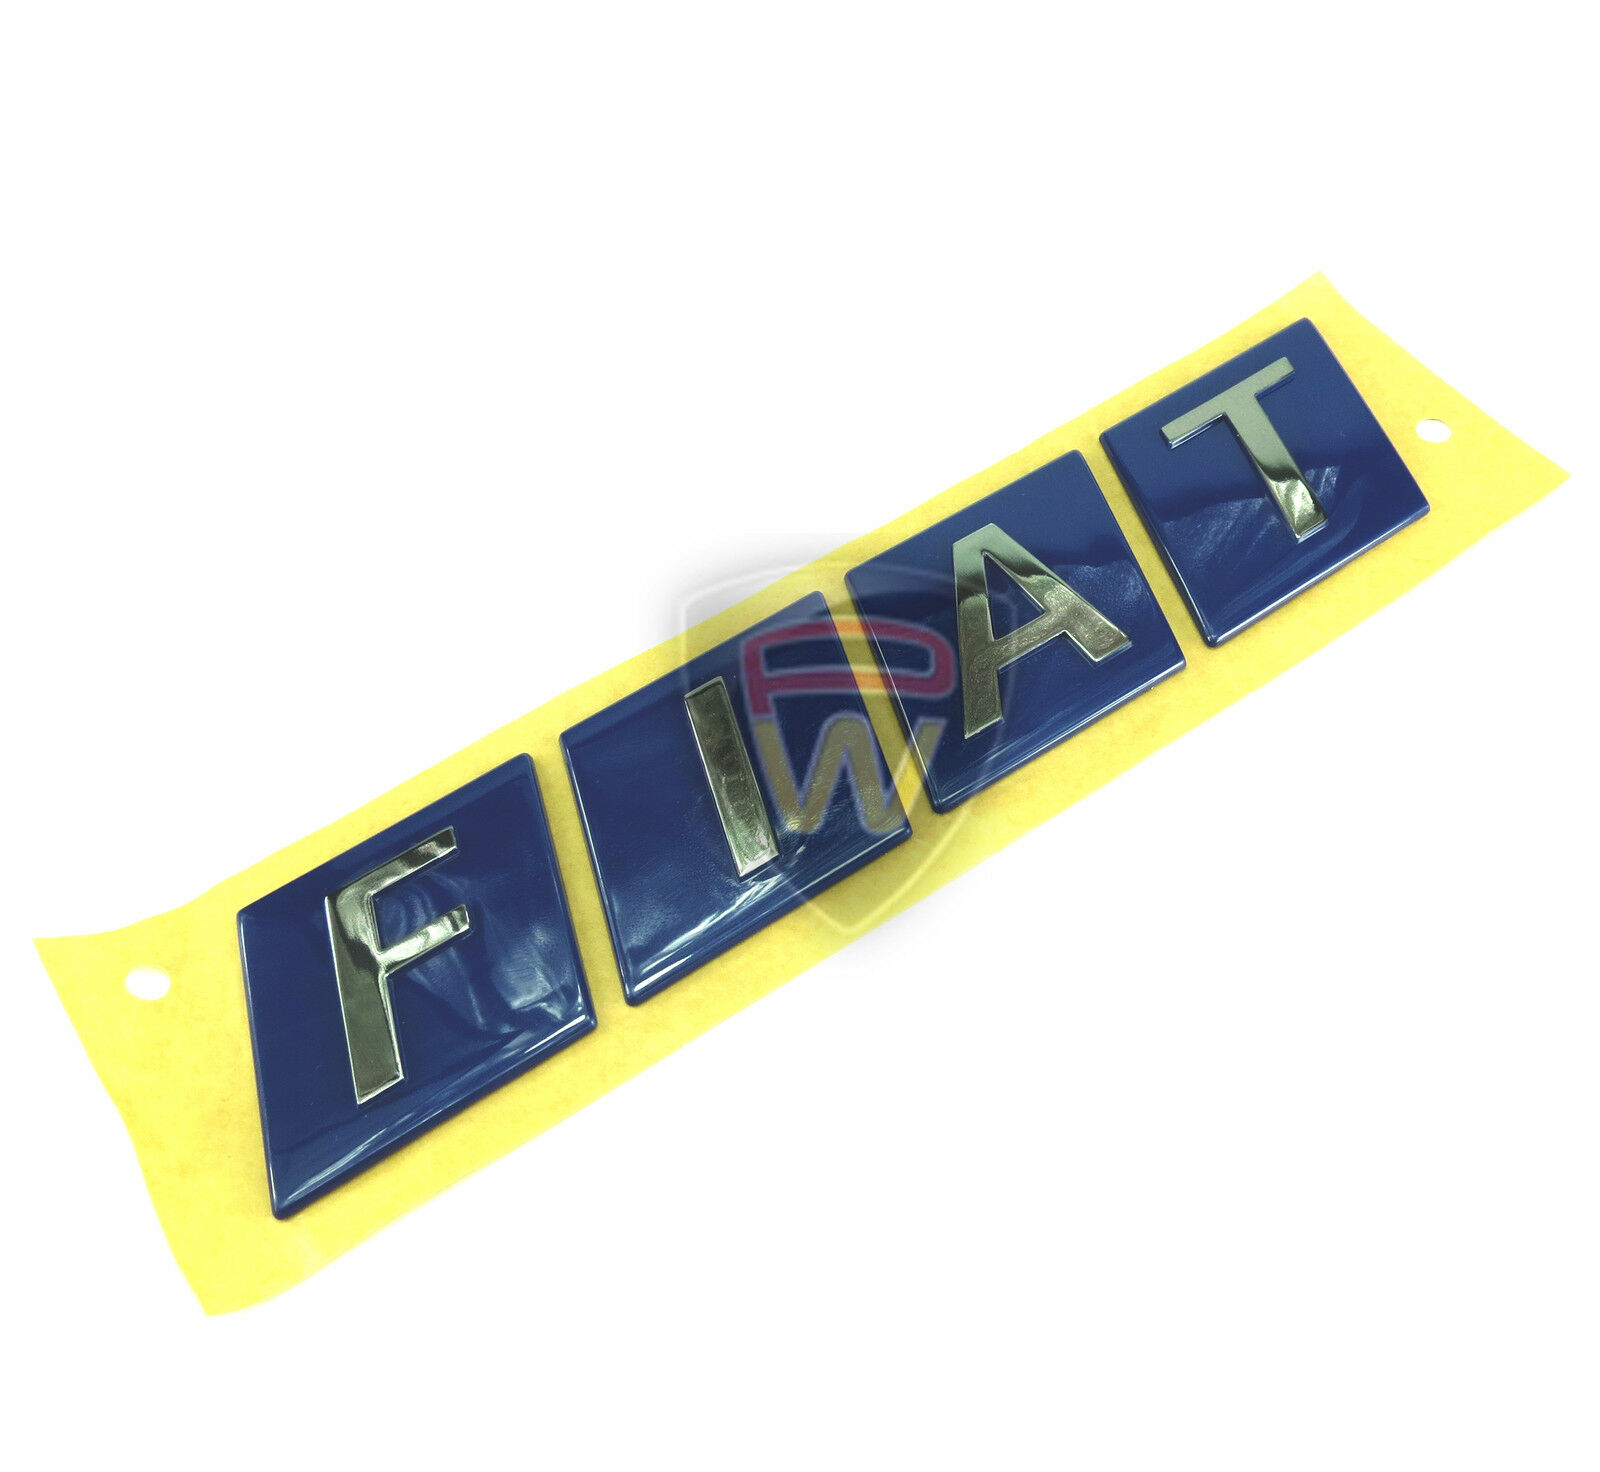 Fiat ducato power badge chrome effet 84mm x 10mm genuine fiat 1347957080